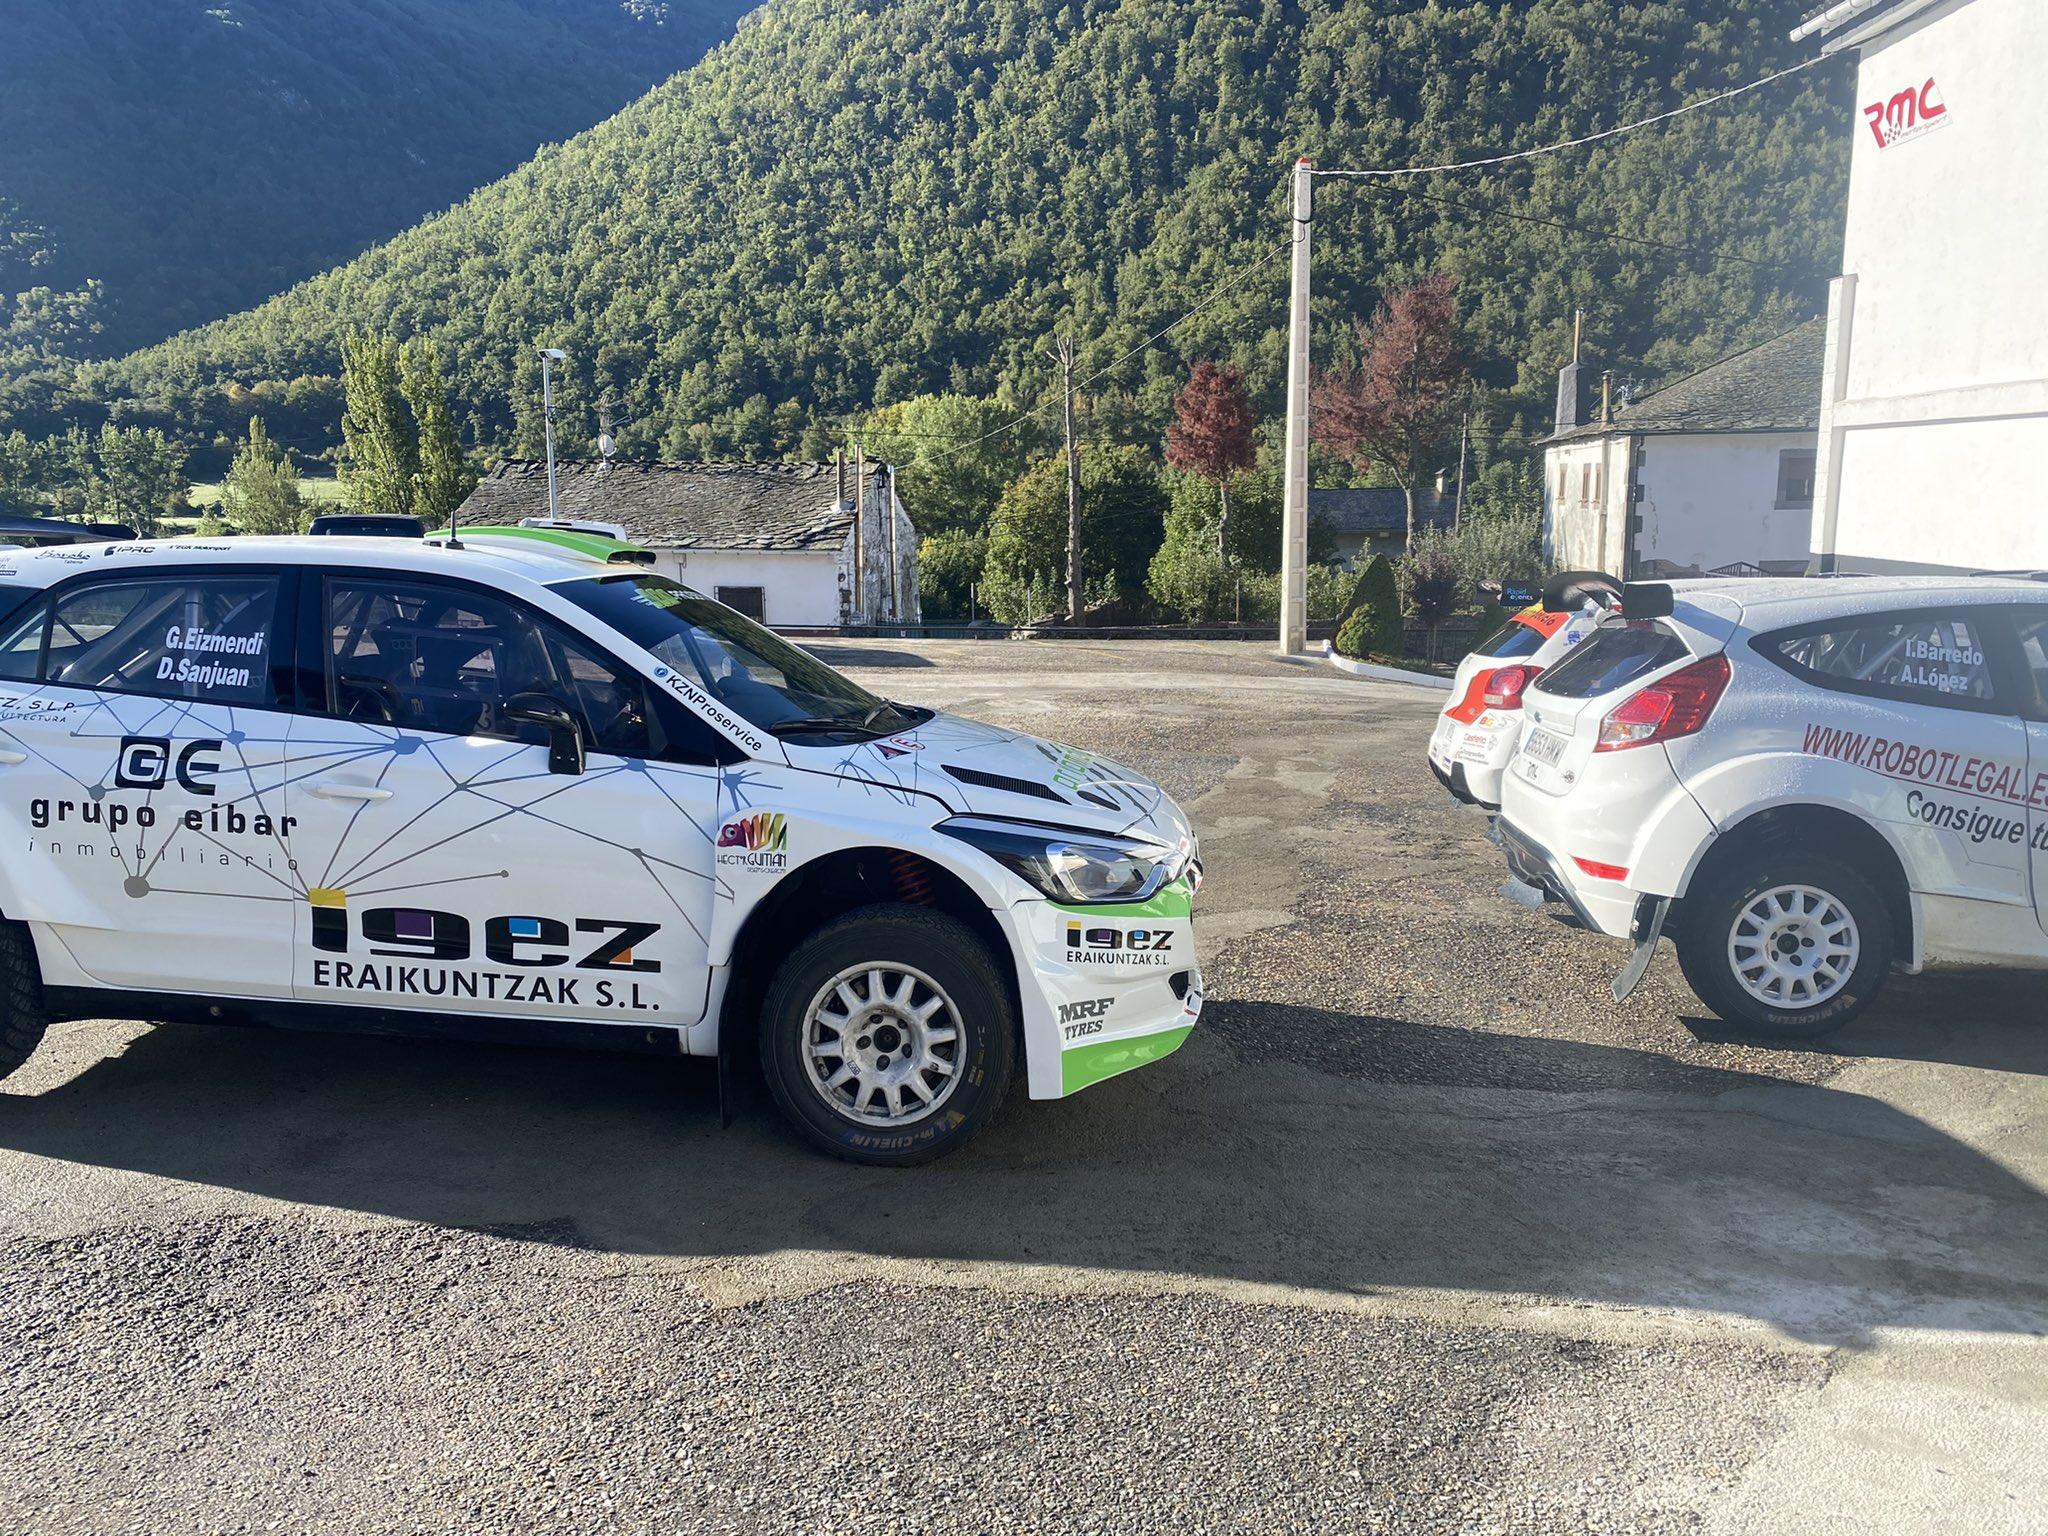 SCER + CERT: Rallye de Tierra de Madrid [8-9 Octubre] FBFW90BXoAI8ZKF?format=jpg&name=large